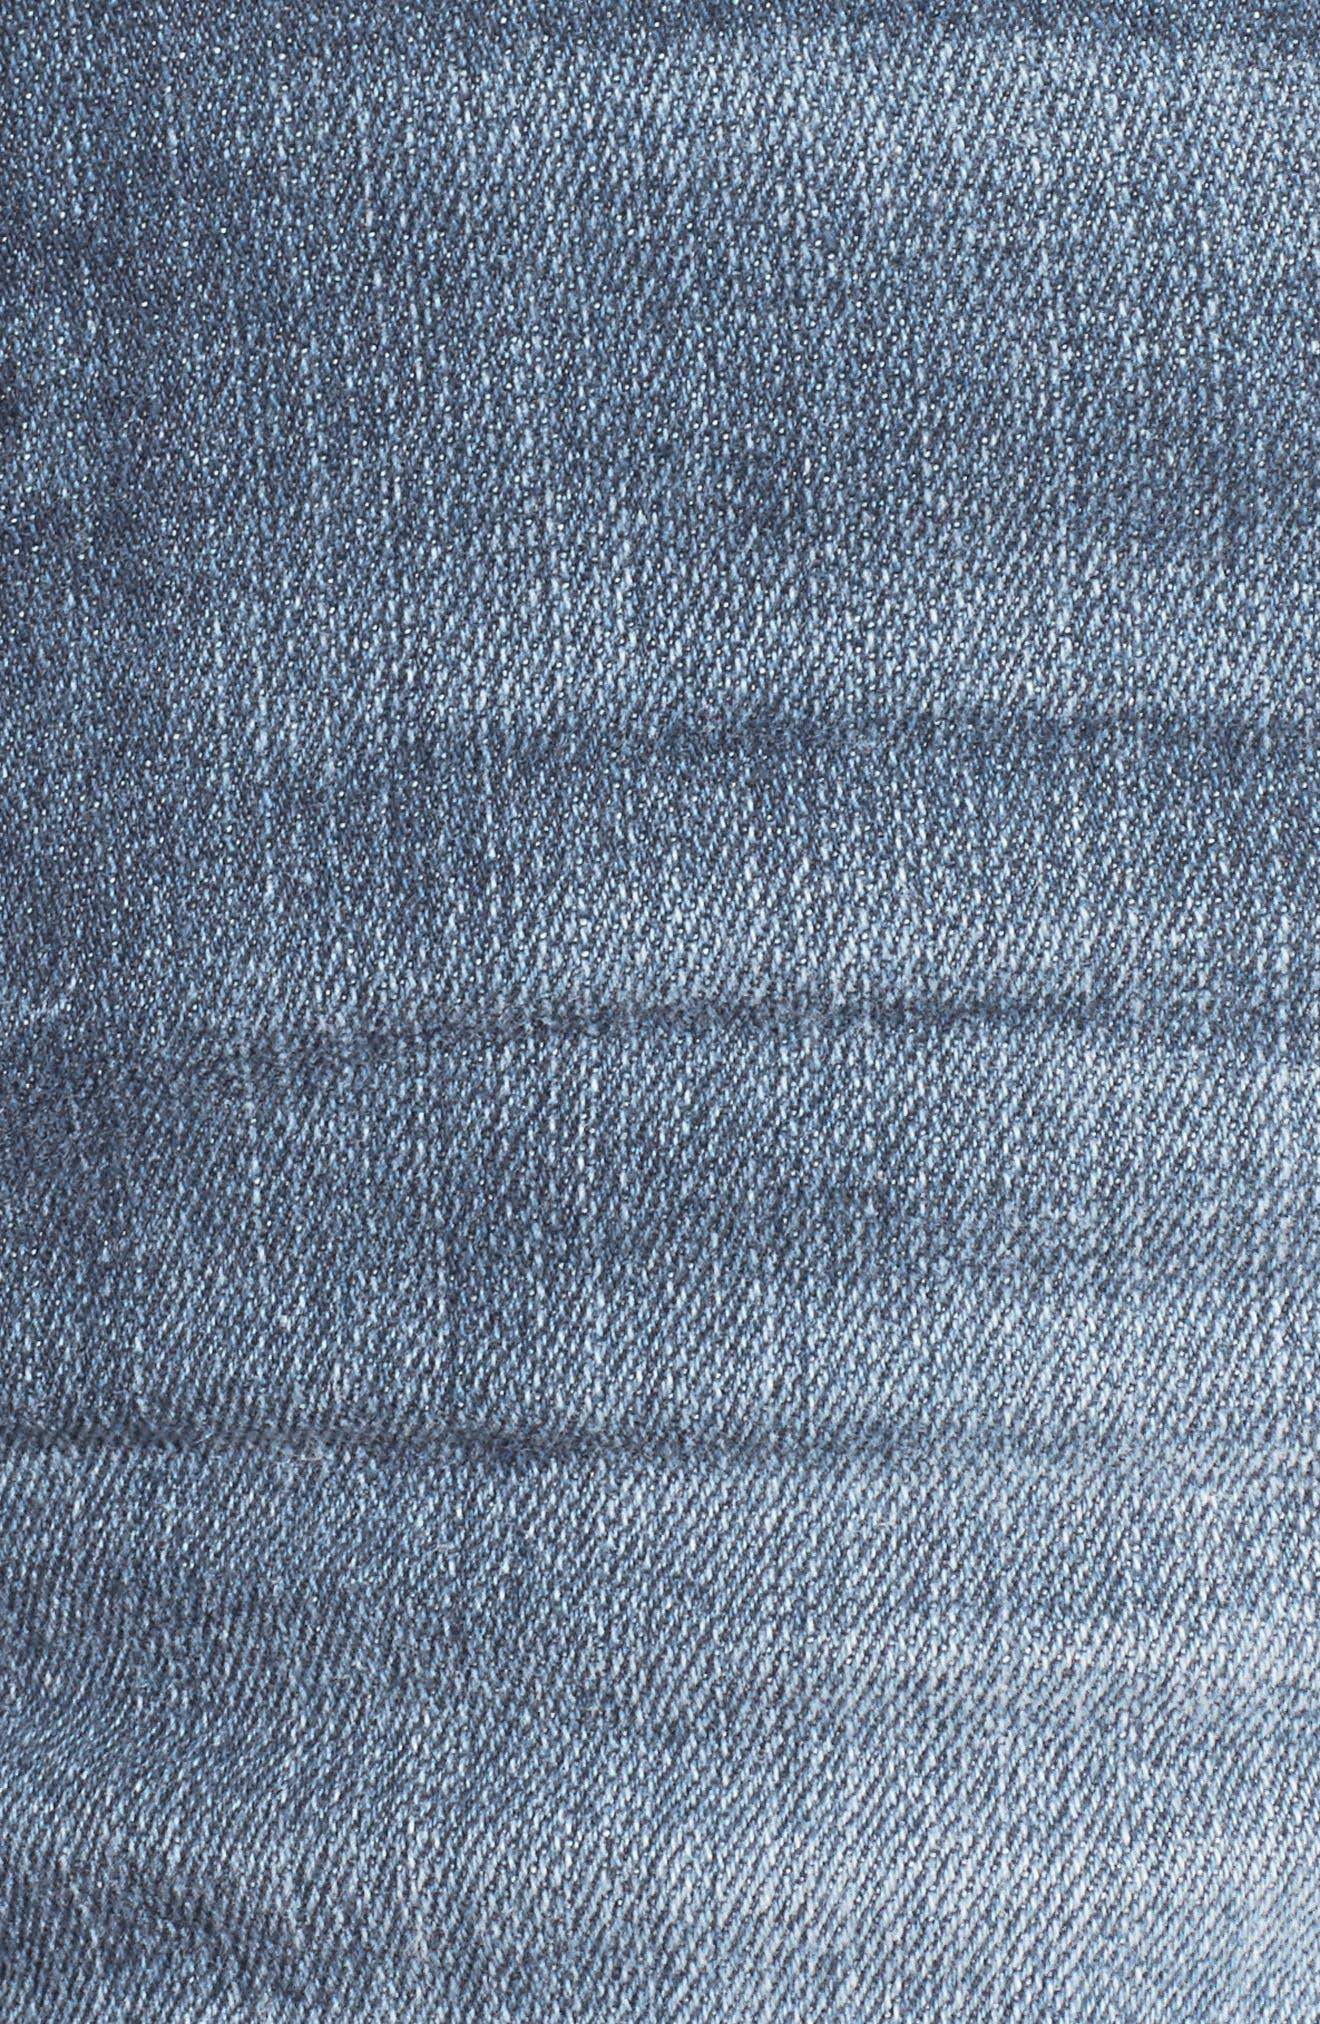 Rose Bowl Denim Shorts,                             Alternate thumbnail 6, color,                             East Volta